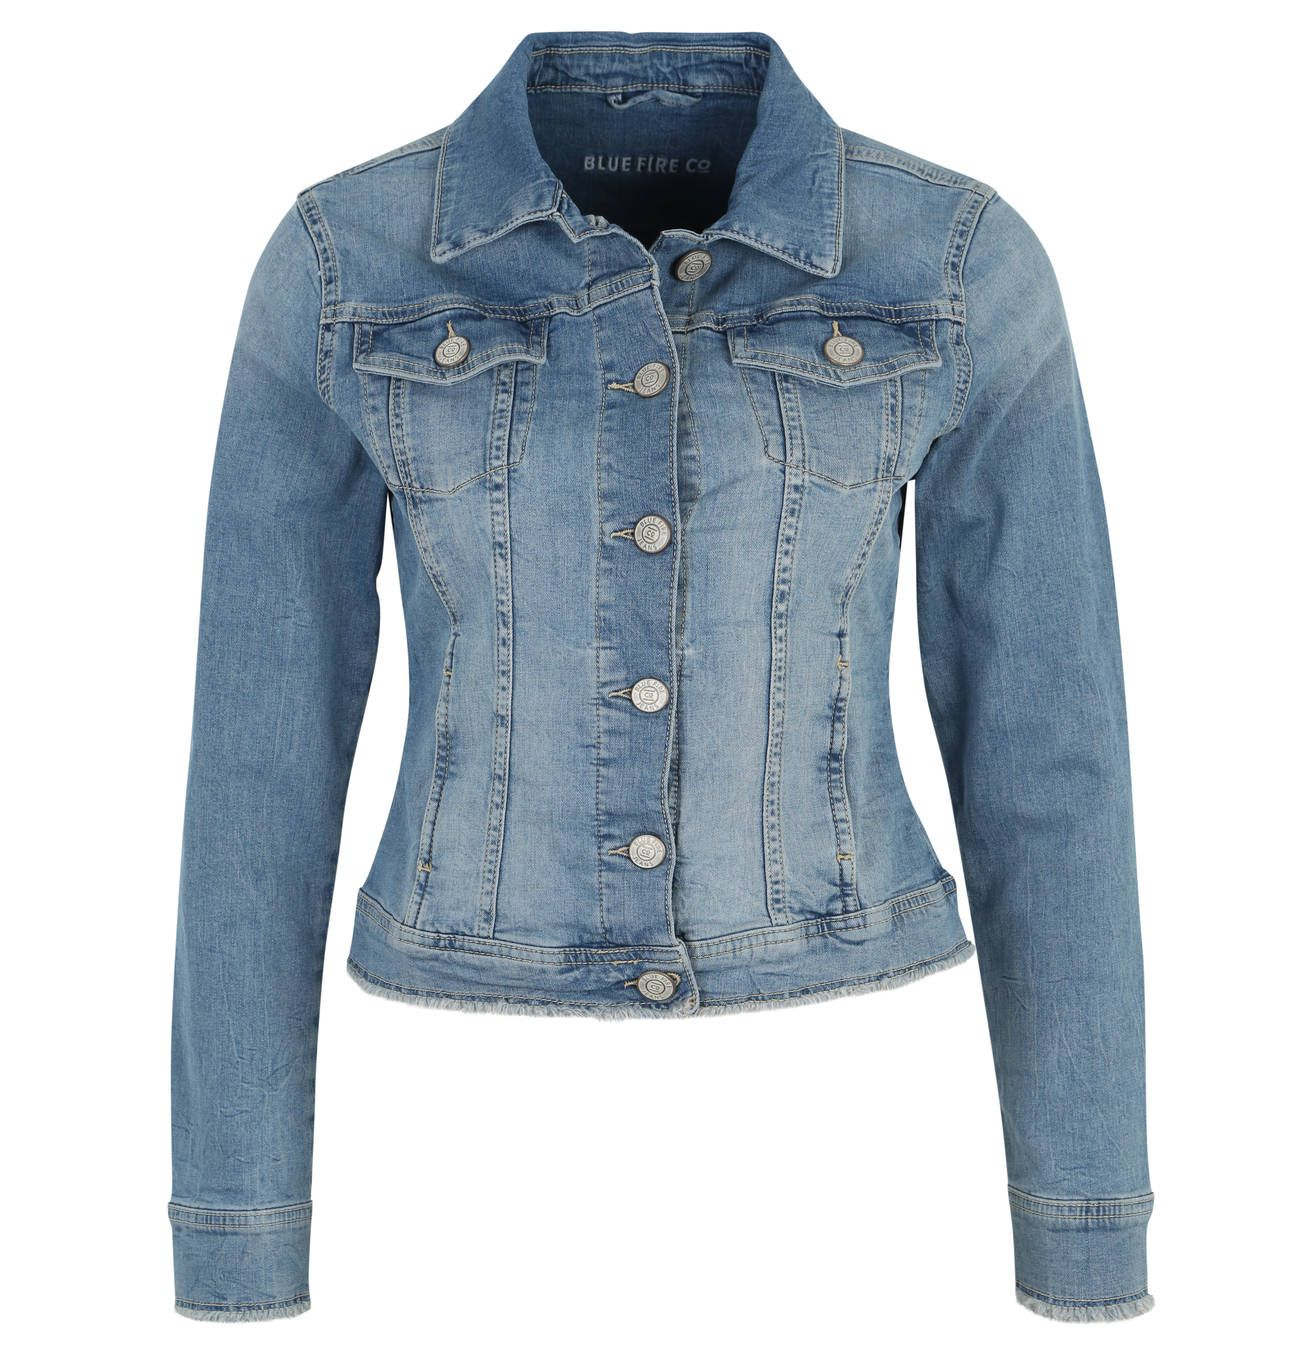 jeansjacke damen galeria kaufhof